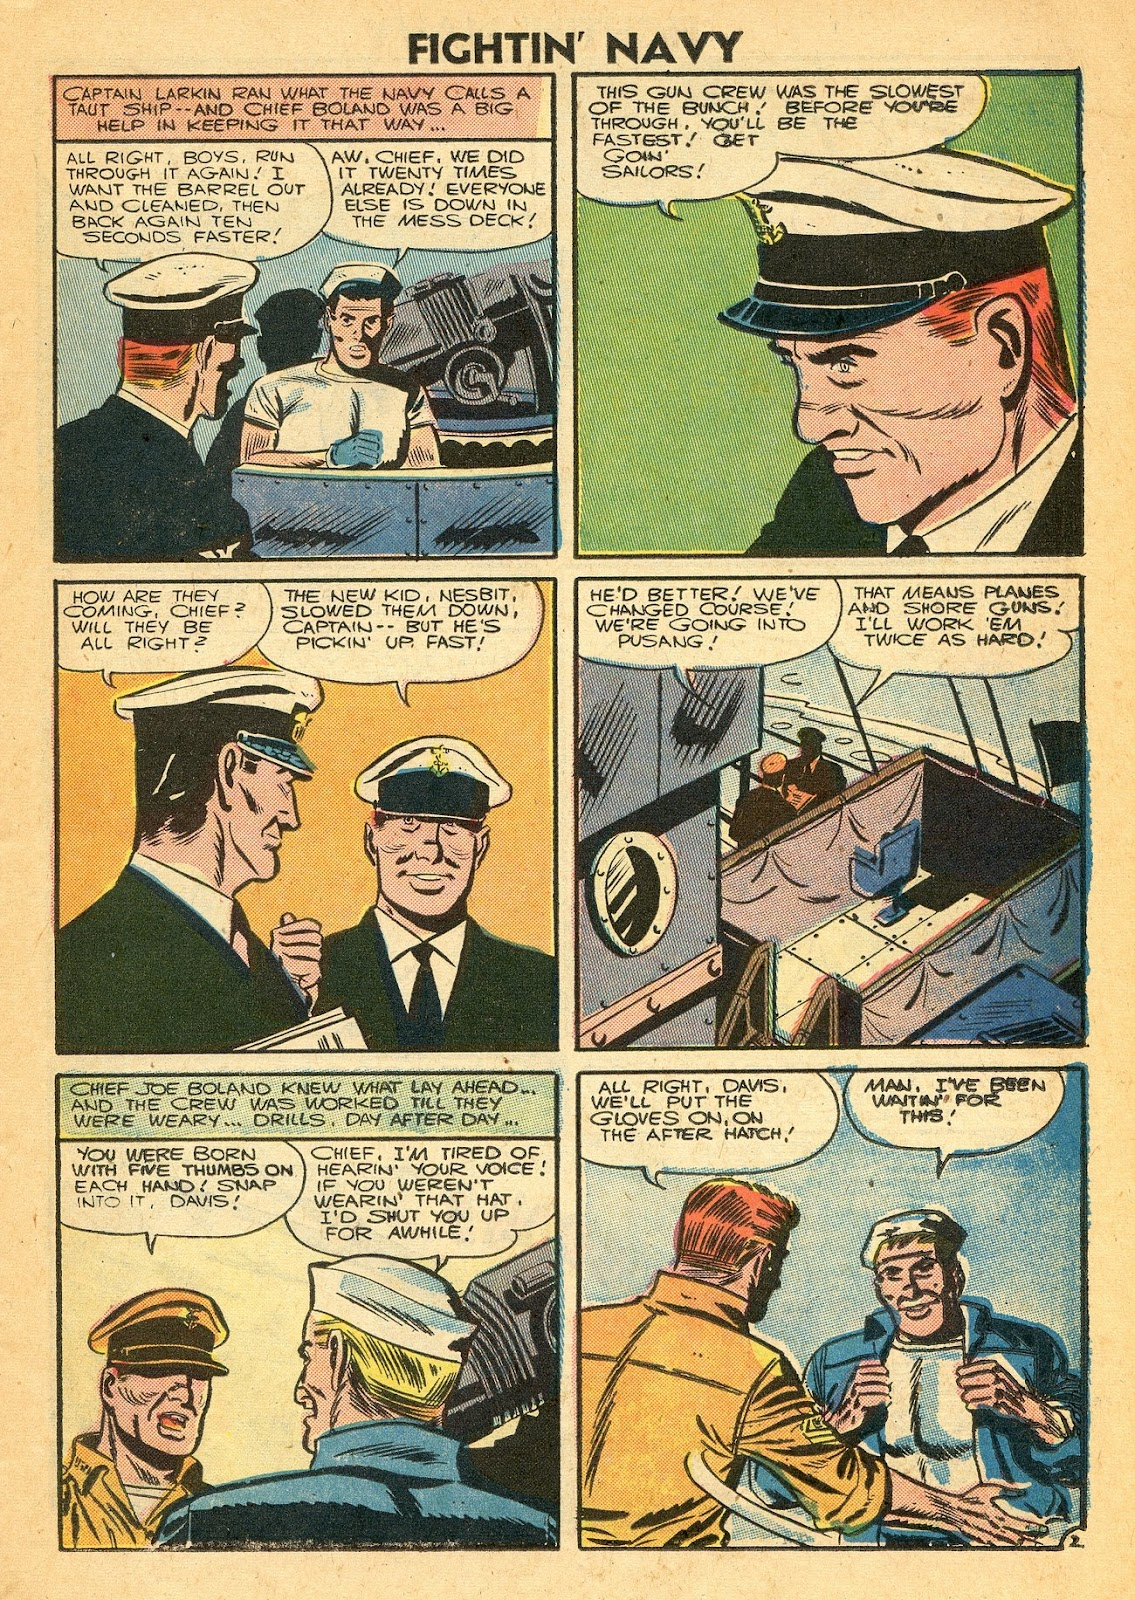 Read online Fightin' Navy comic -  Issue #77 - 11